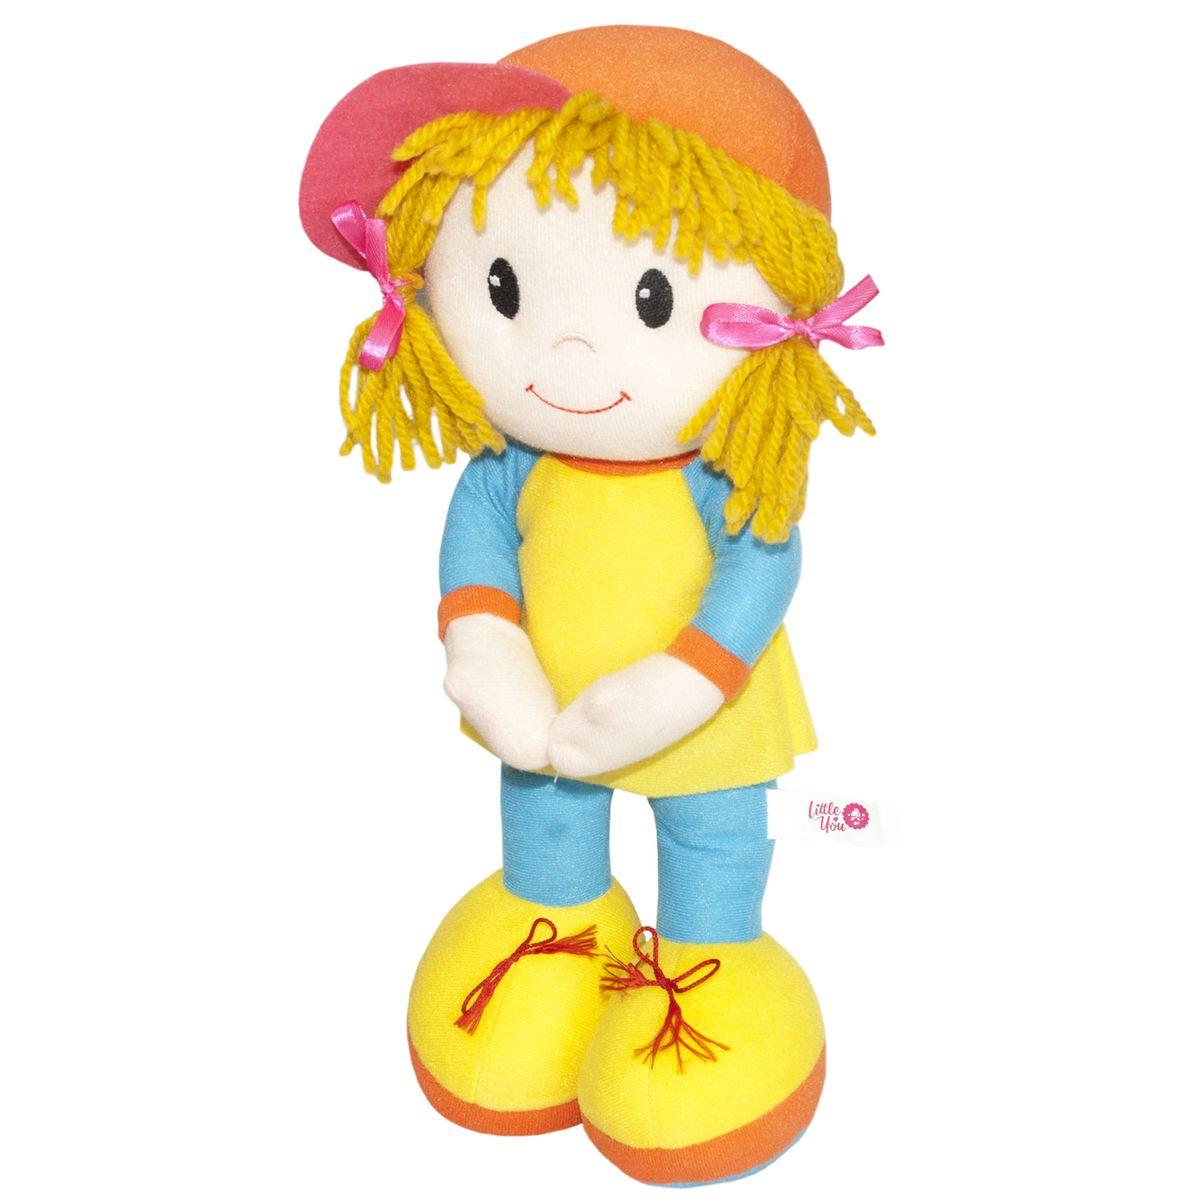 Little You Мягкая кукла Кейт цвет одежды голубой желтый кукла pullip grell little